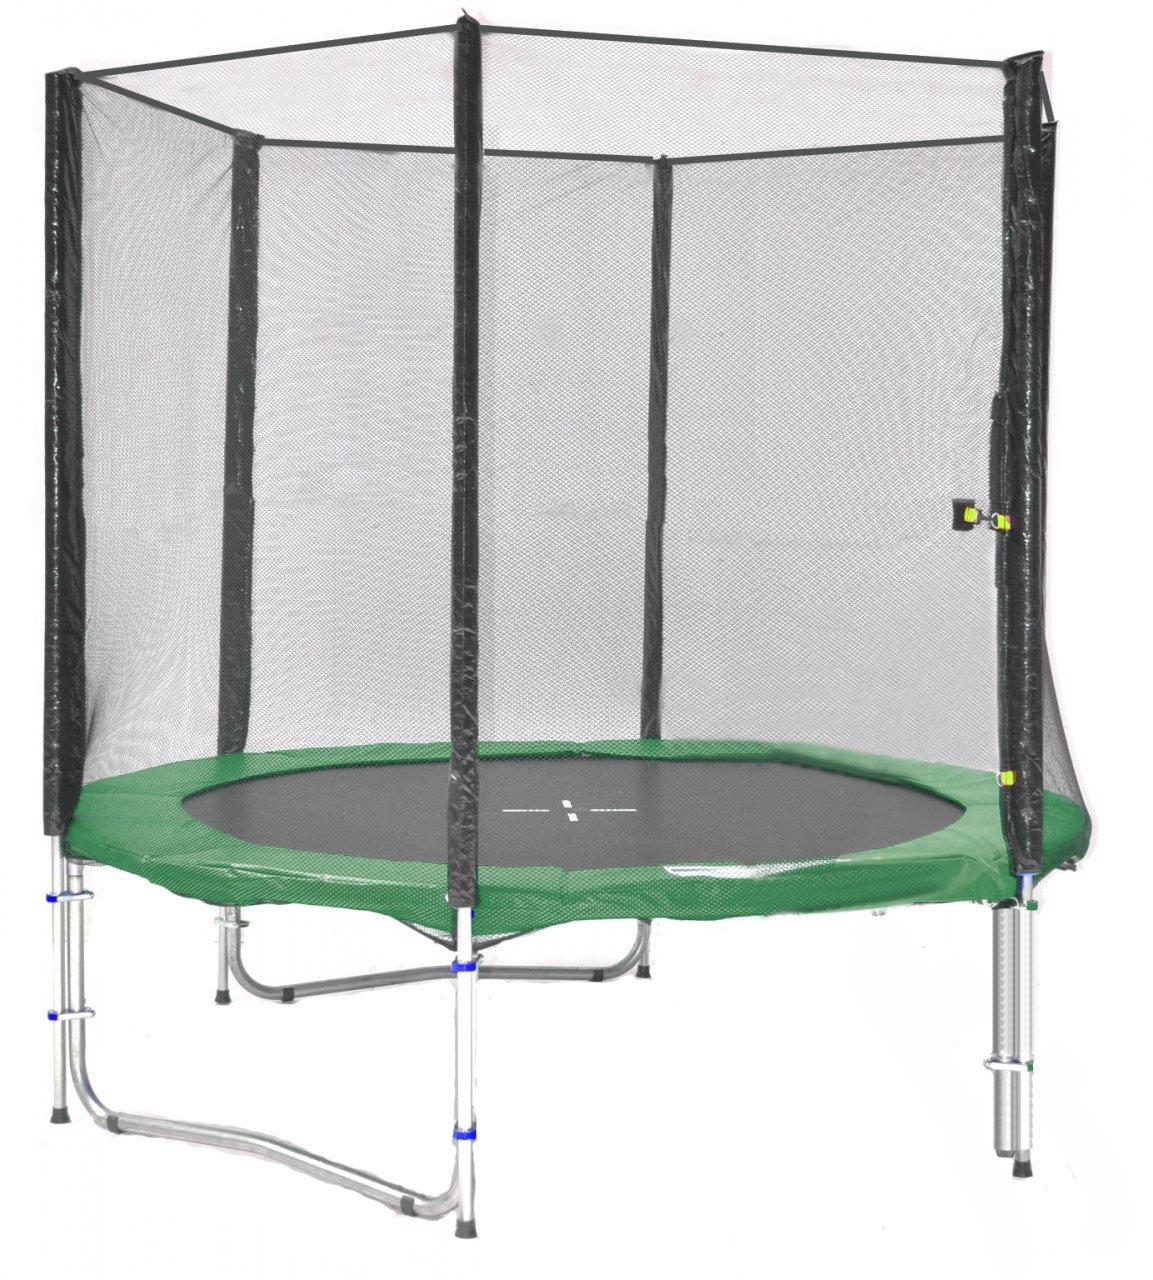 SB-185-G Professionell Gartentrampolin 185cm incl. Netz, Leiter 90kg Traglast günstig